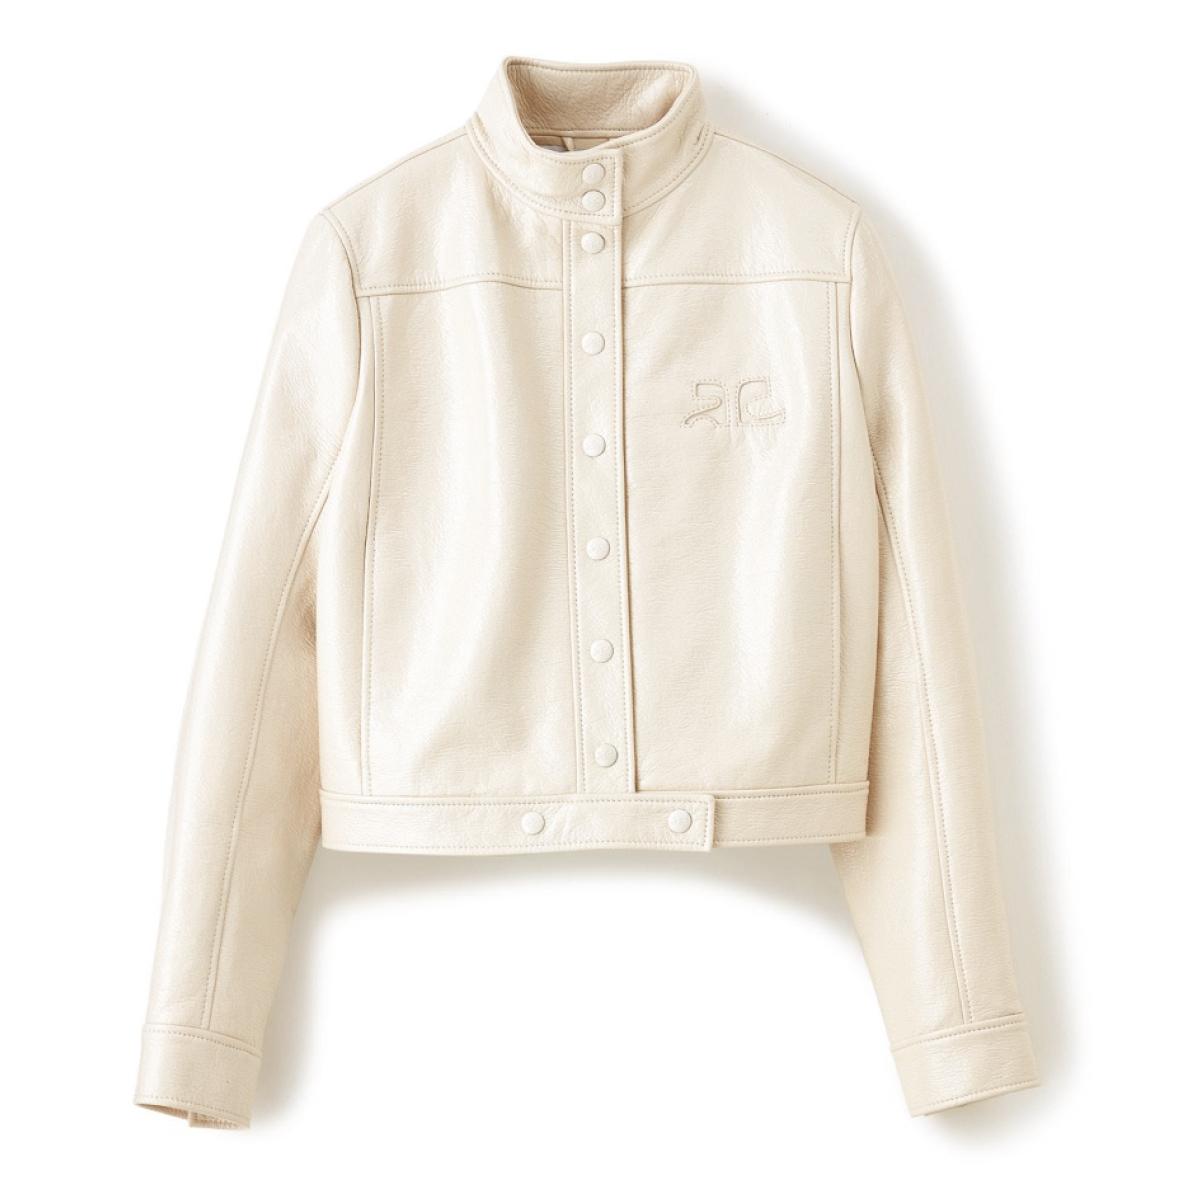 COURREGESのエコビニールジャケット